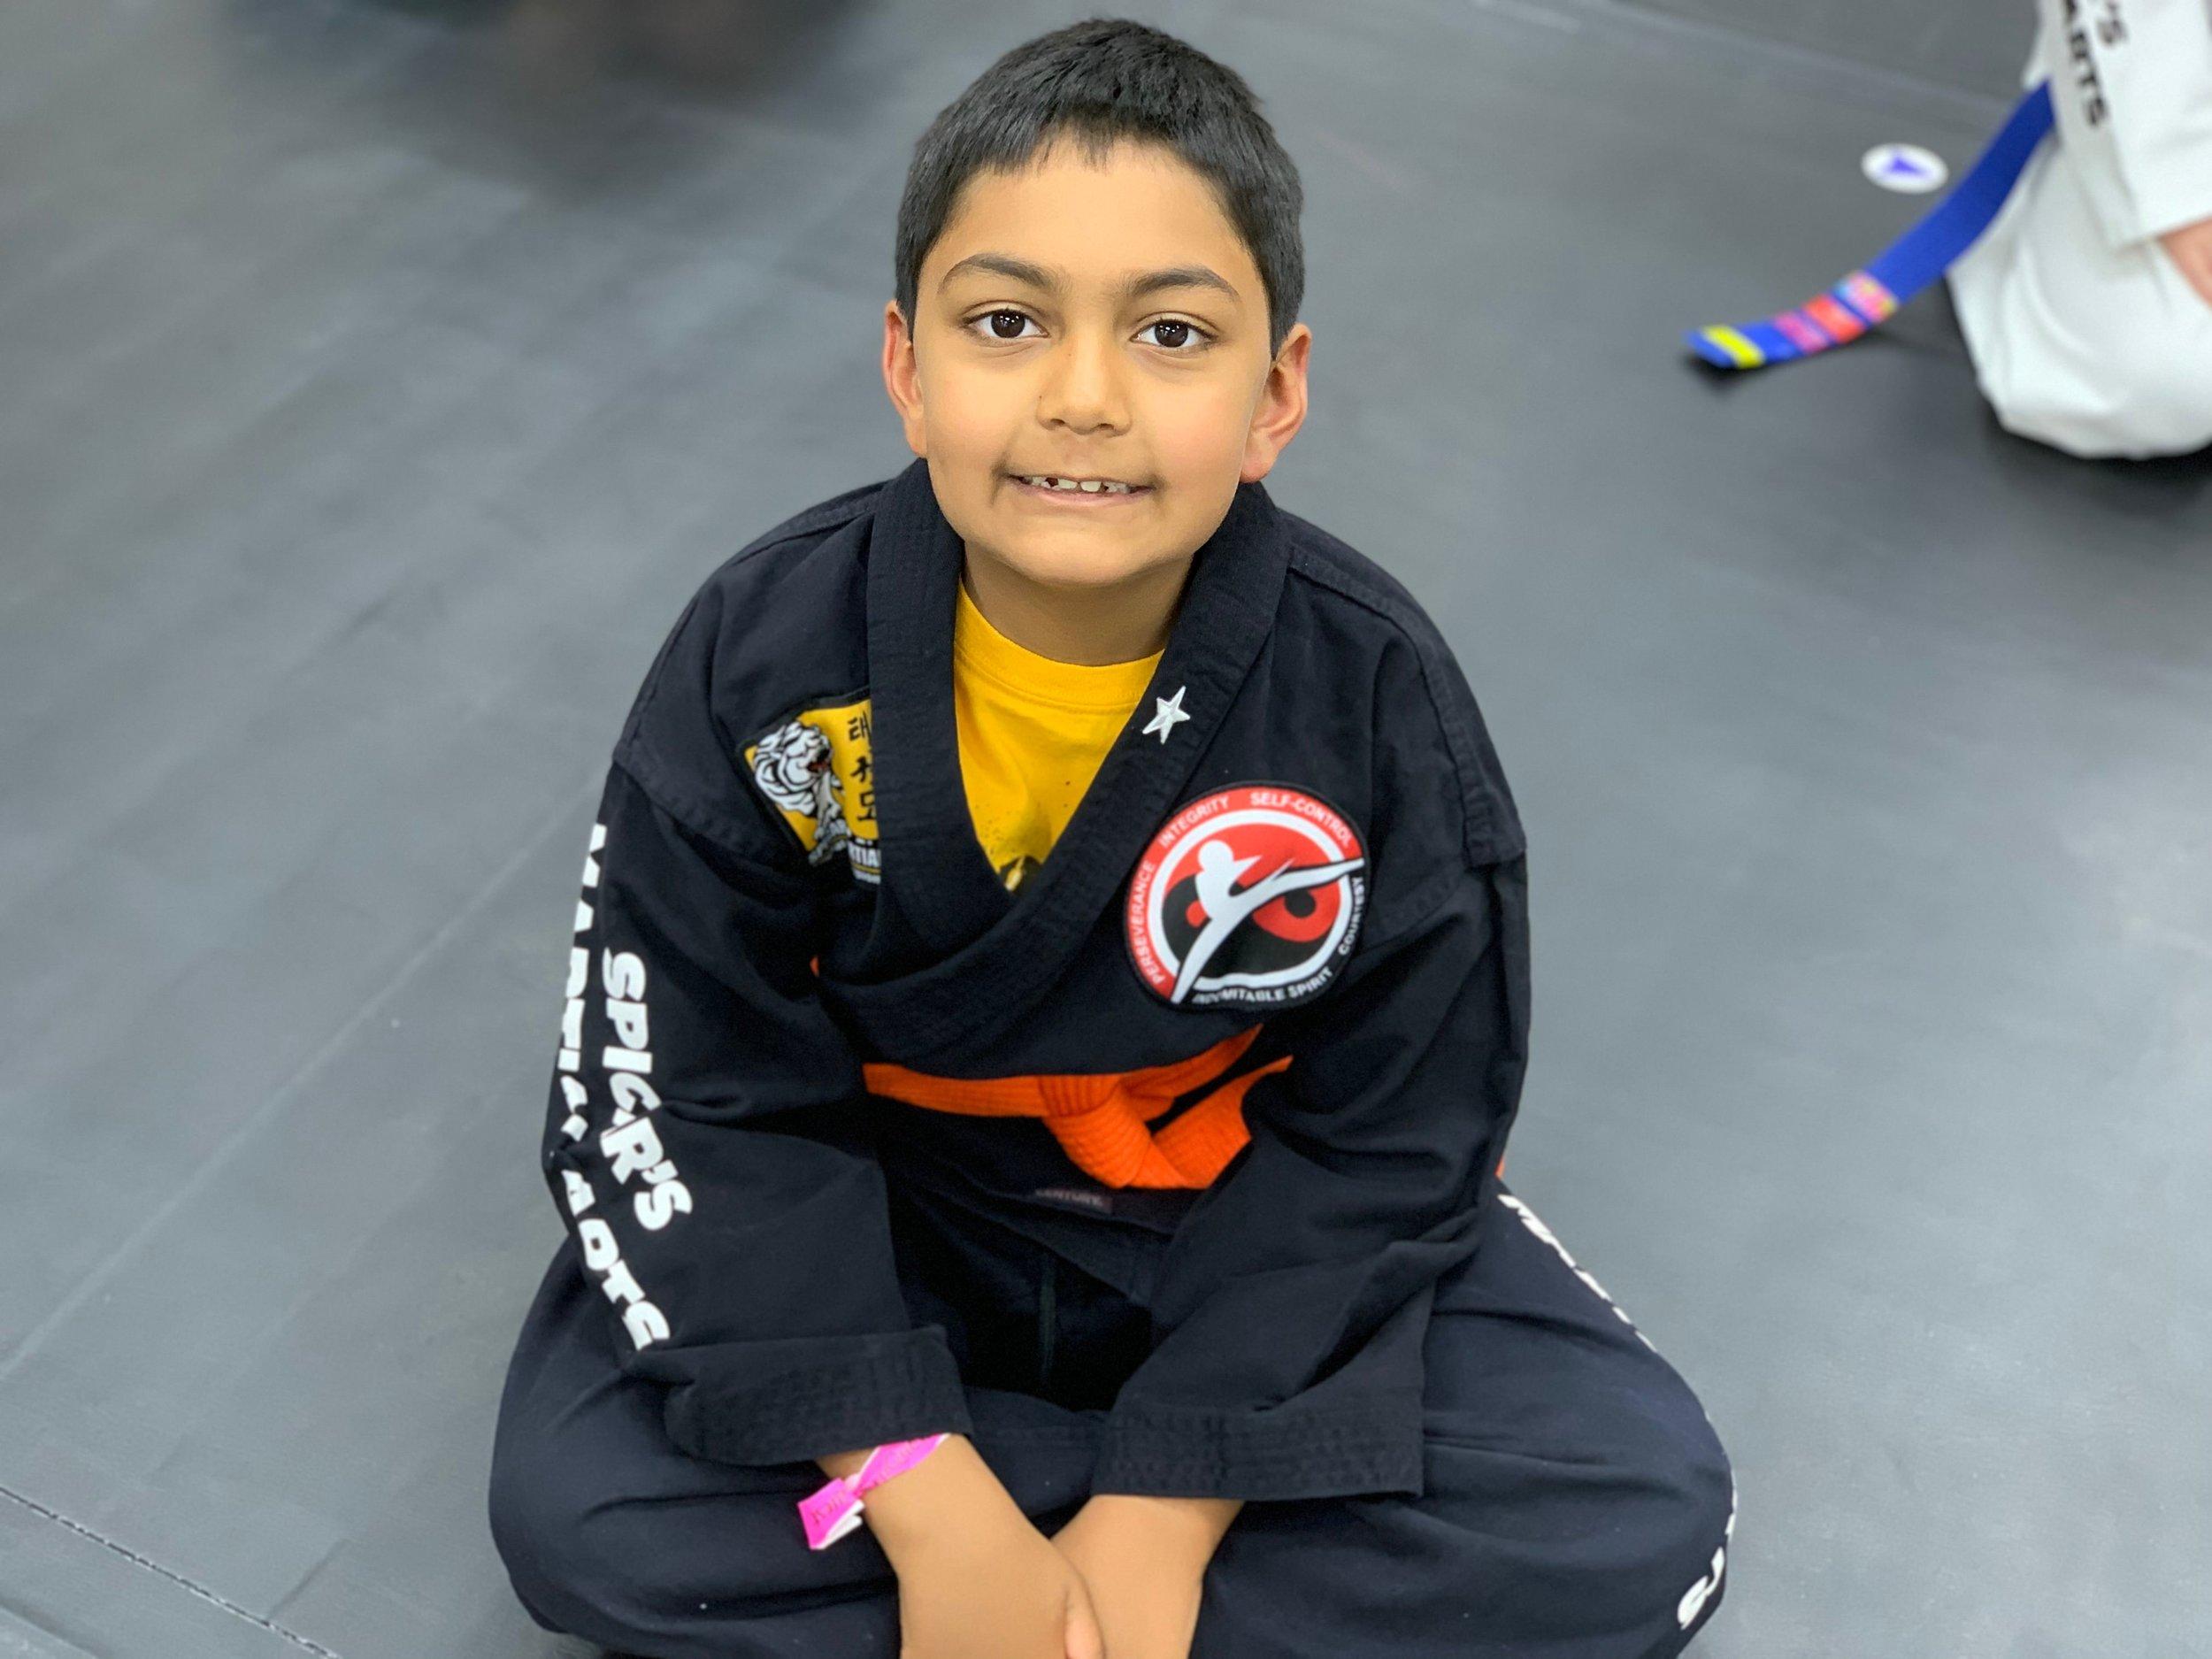 karate-kids-program-souhtlake-keller-grapevine-texas00024.jpeg